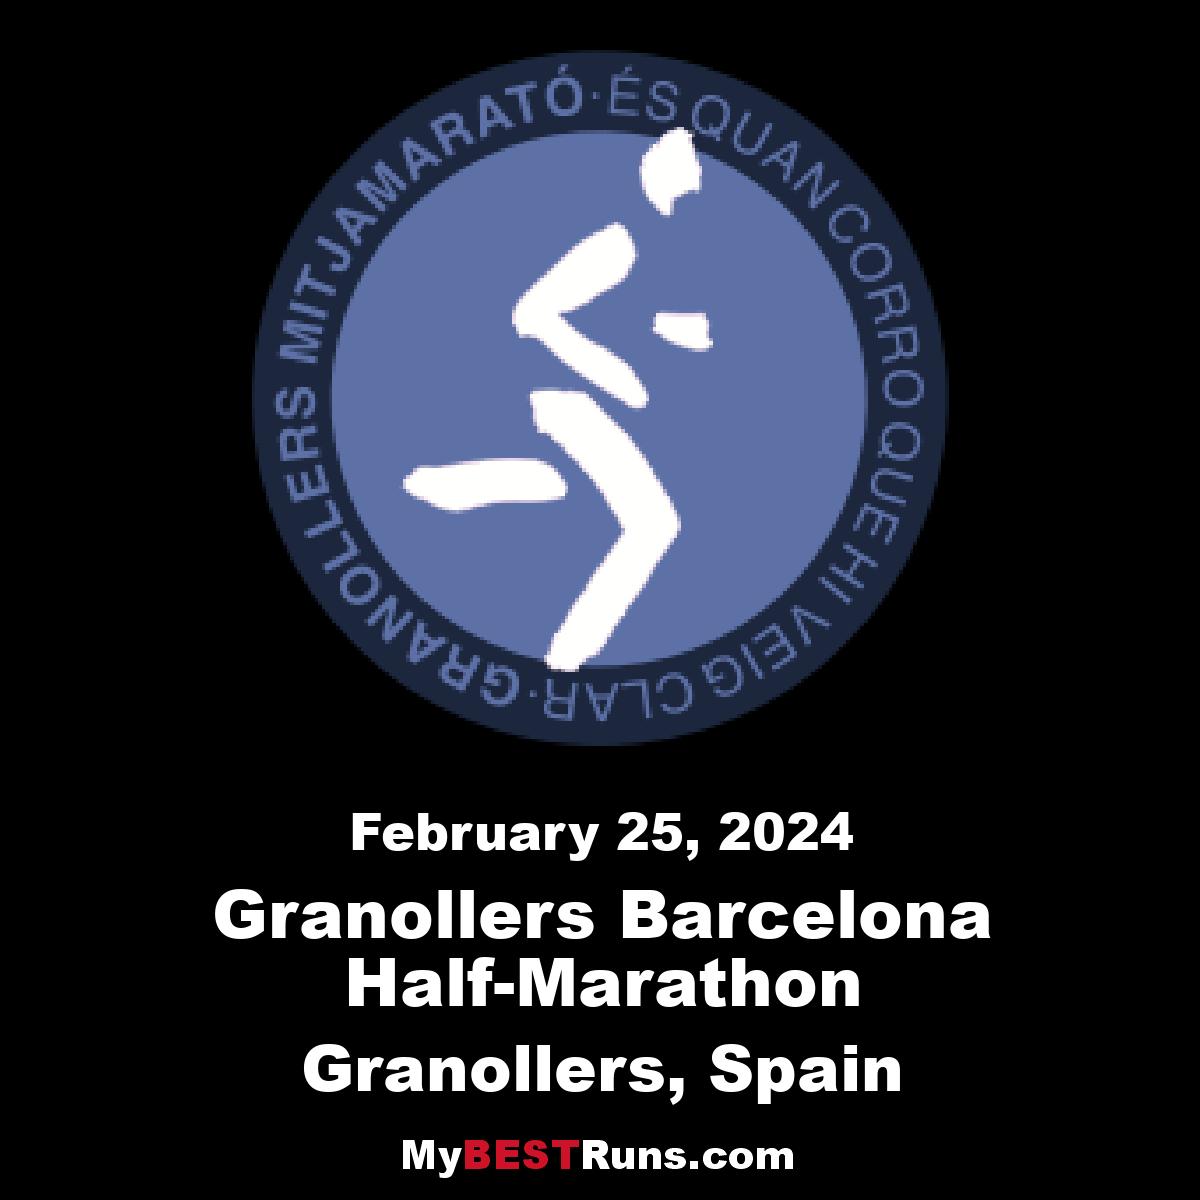 Granollers Barcelona Half-Marathon